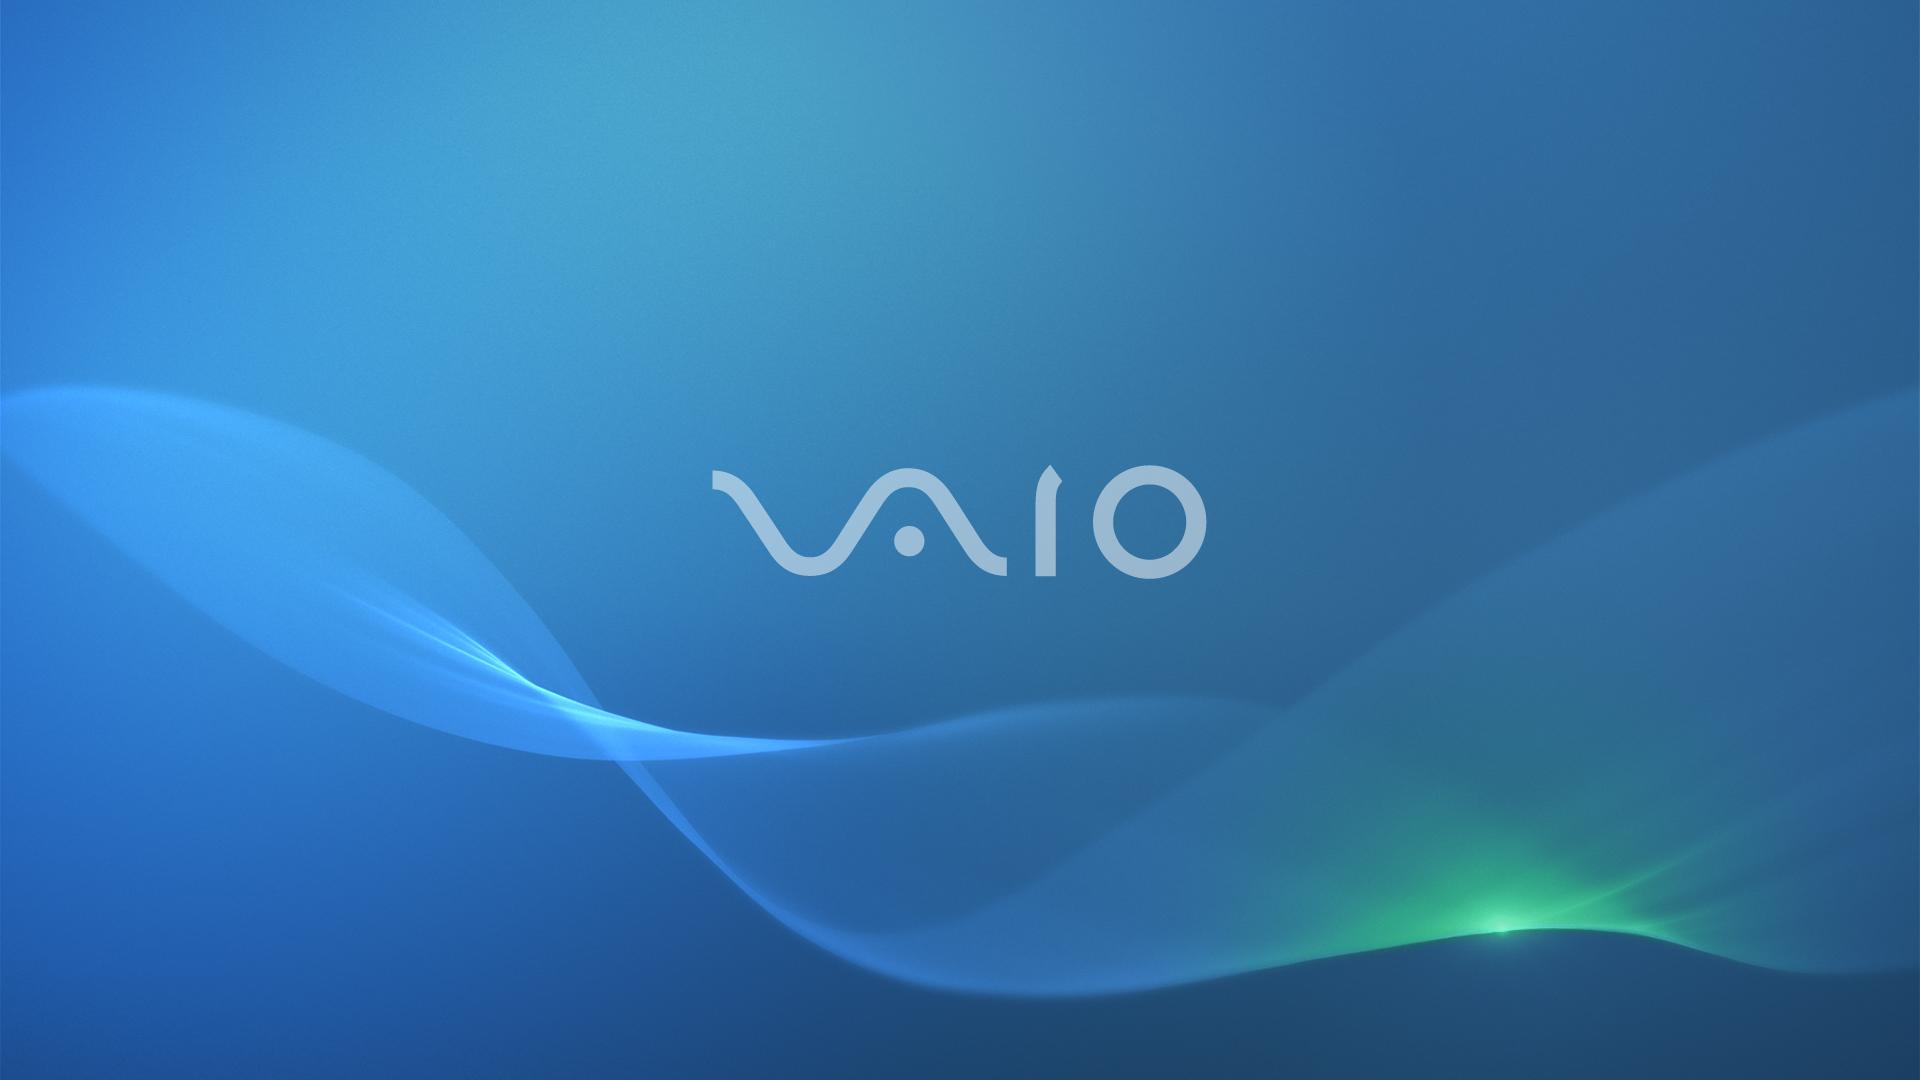 1920x1080 VAIO 09 img5 desktop PC and Mac wallpaper 1920x1080